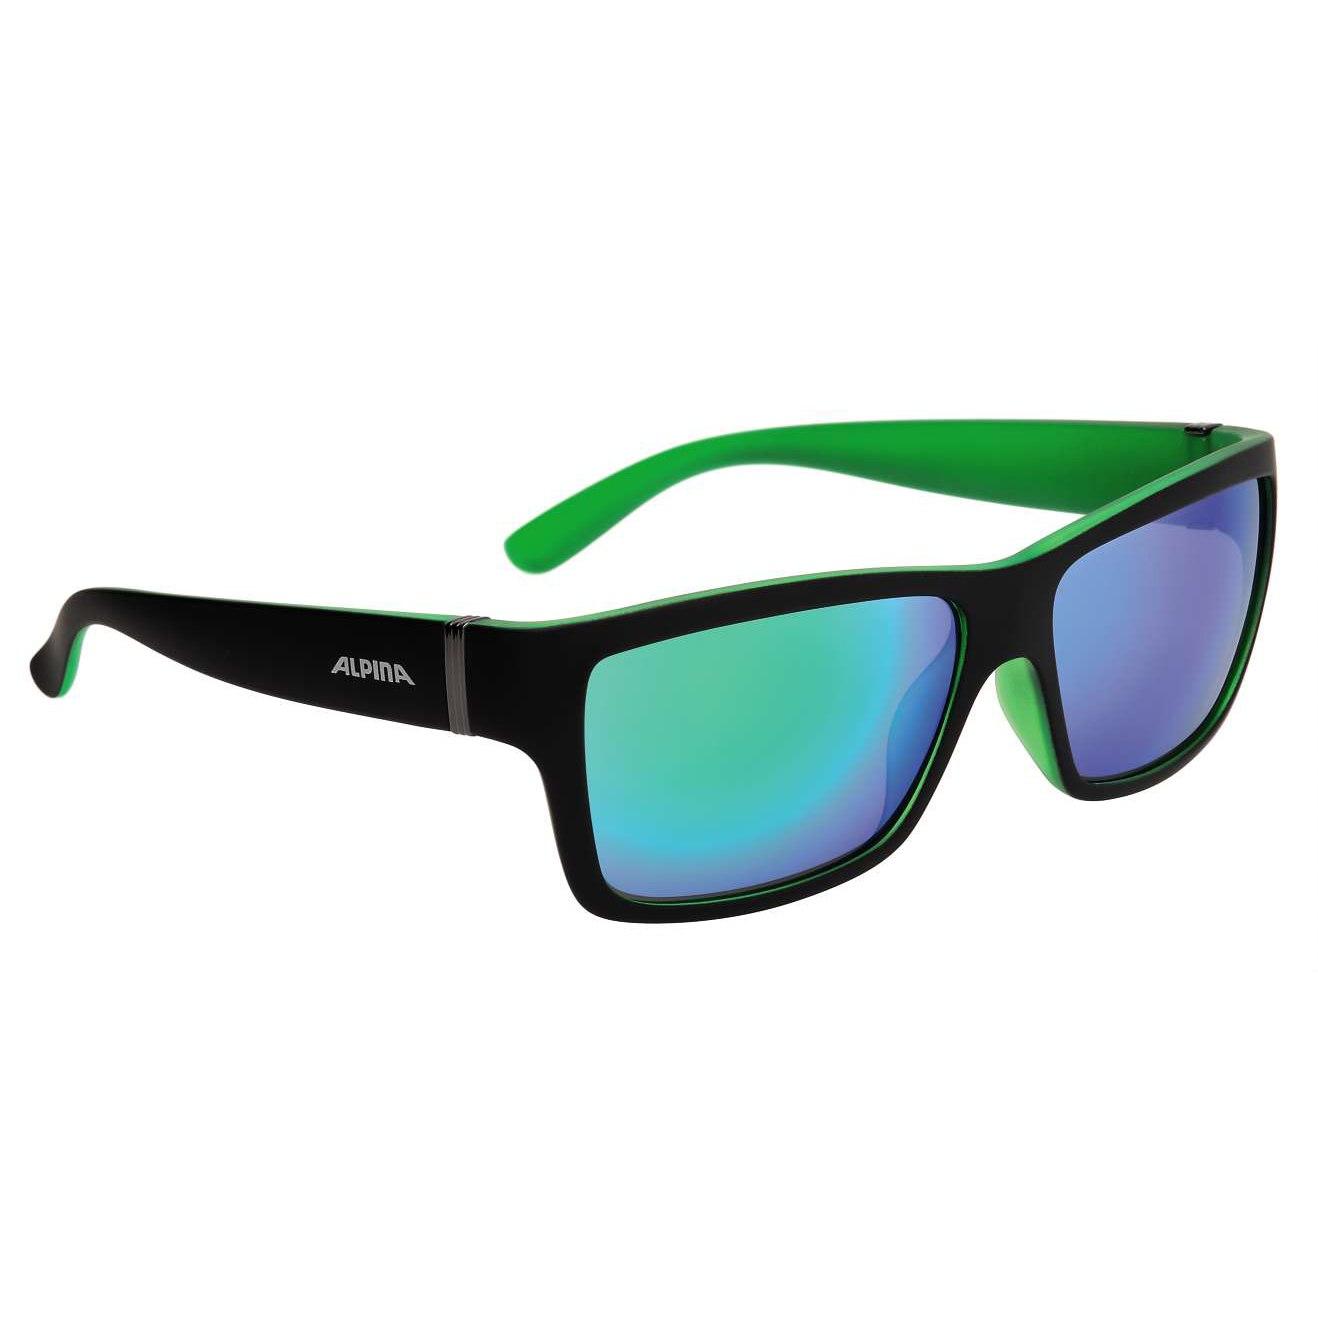 Alpina Kacey Glasses - Black Matt-Green/CeramiC Mirror Green